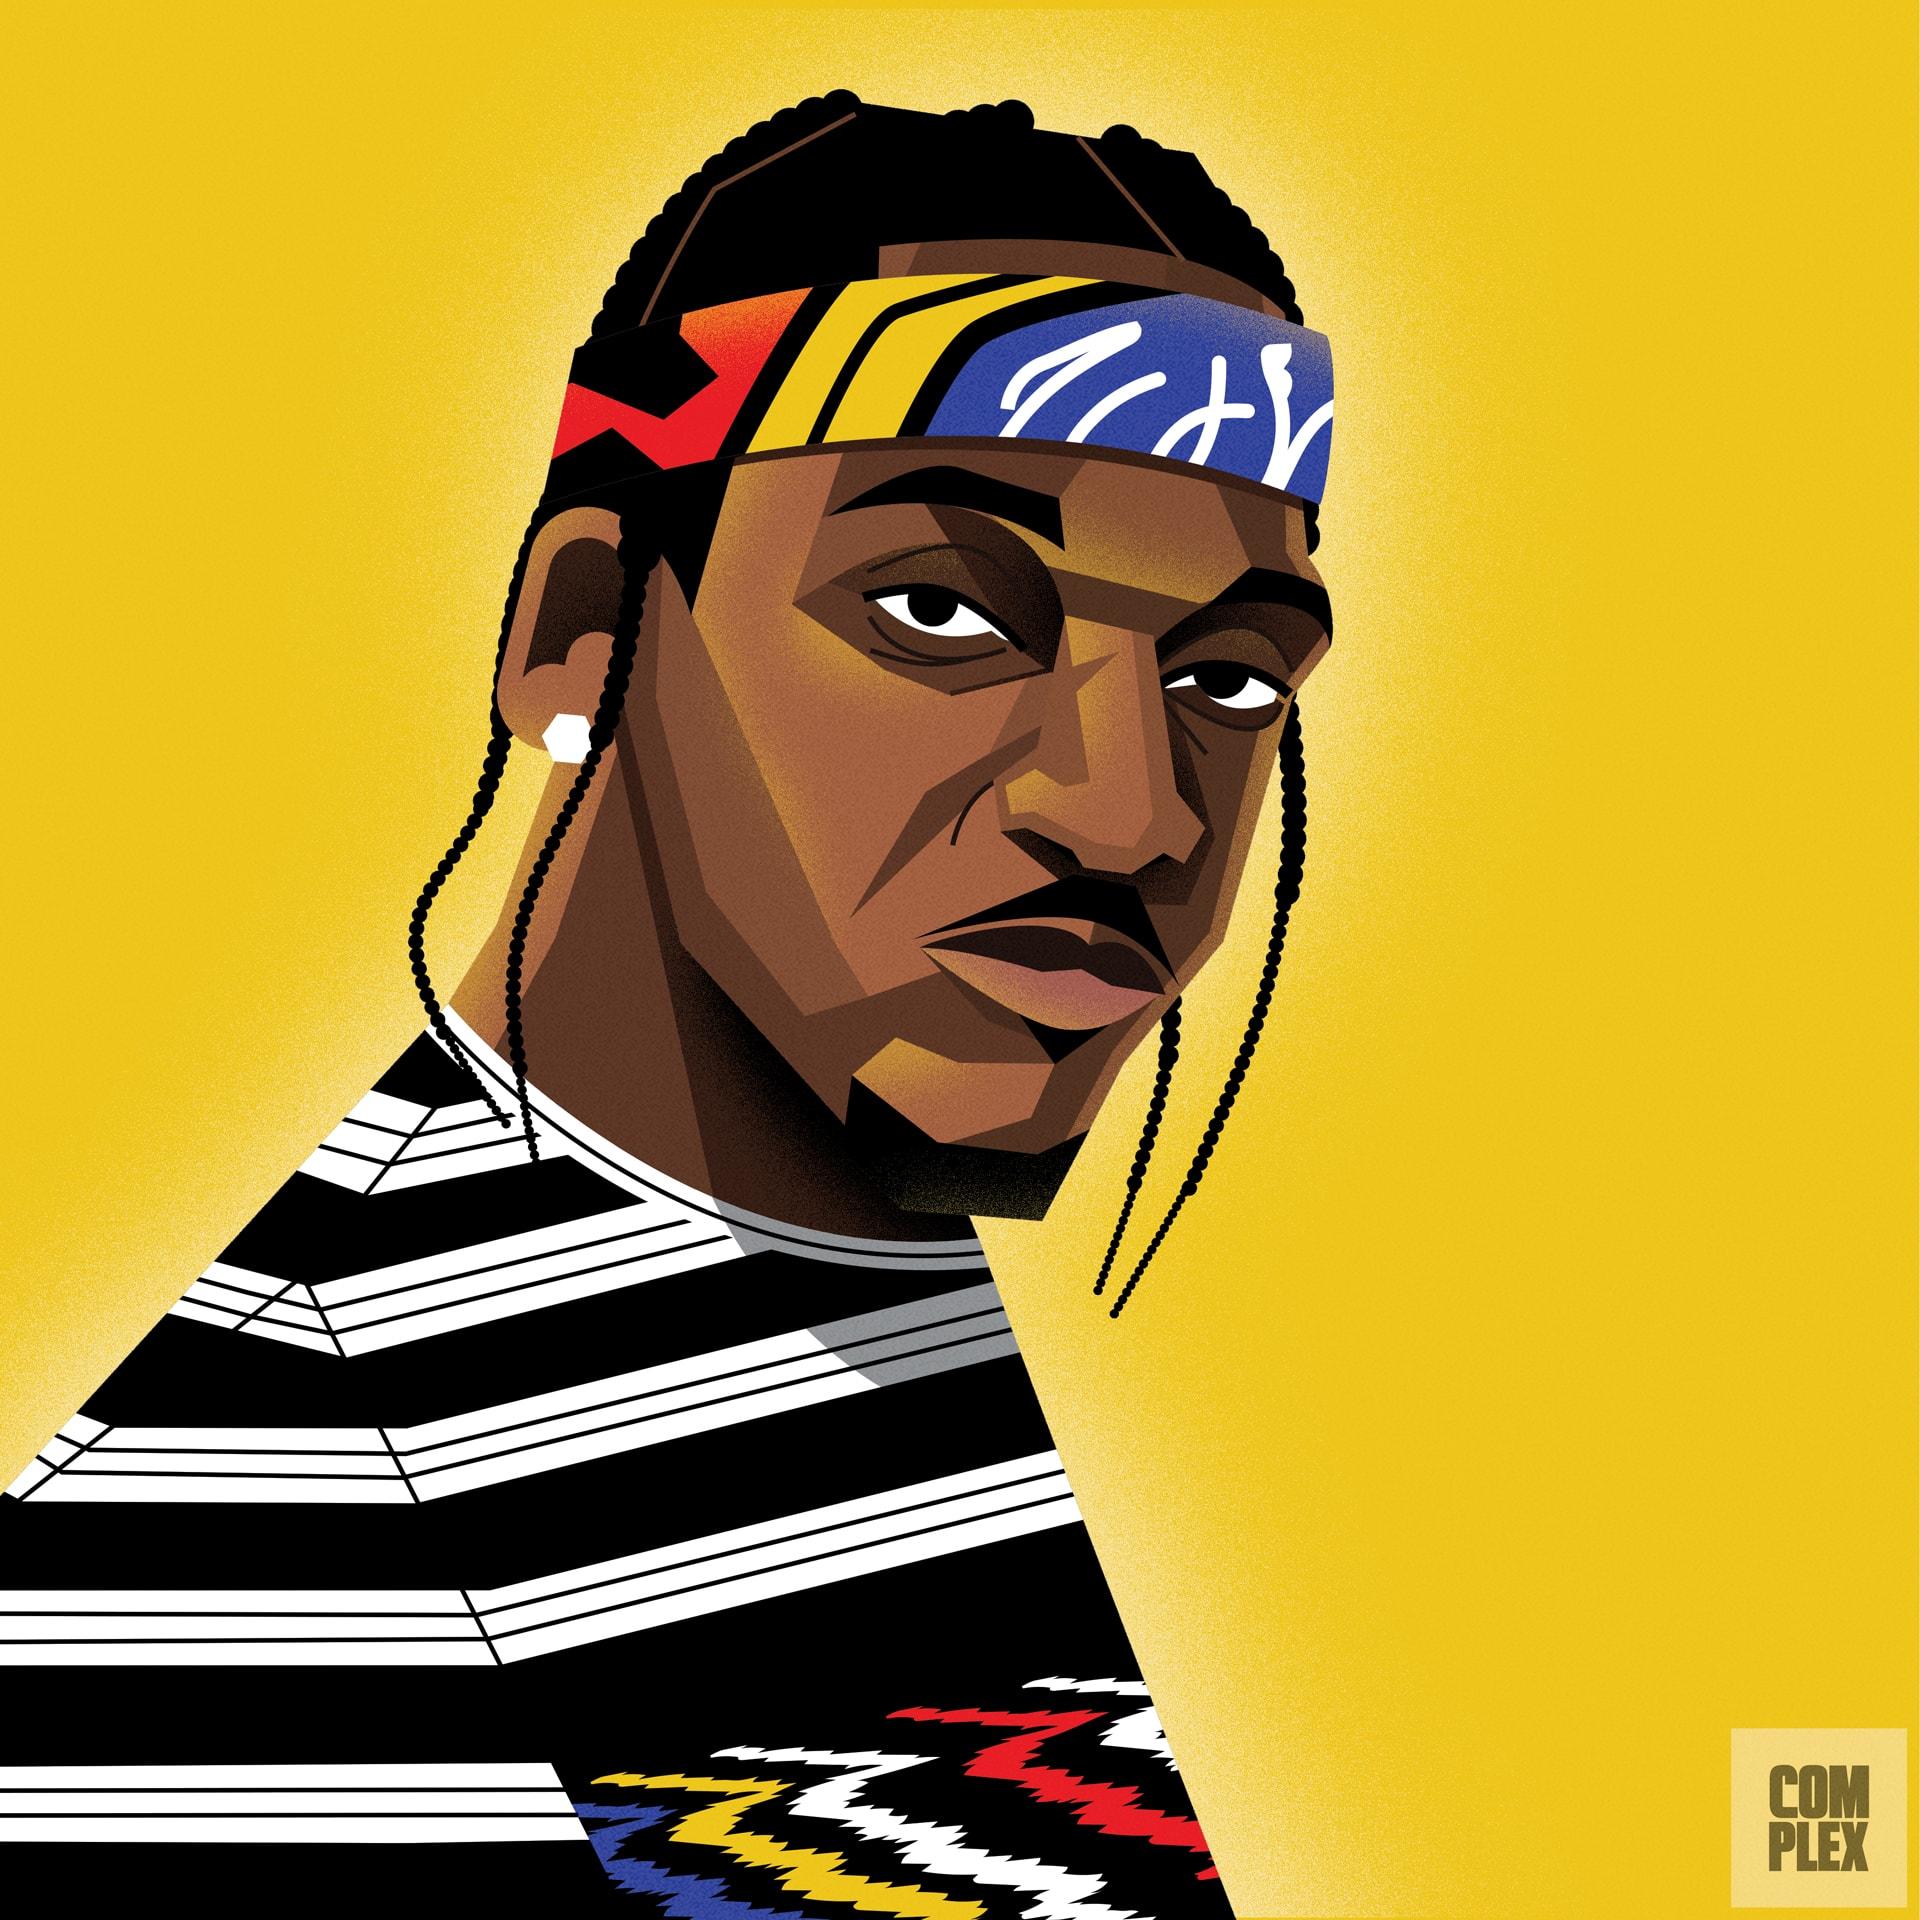 super popular 5a08e 5e09b The Best Rapper Alive, Every Year Since 1979  Complex